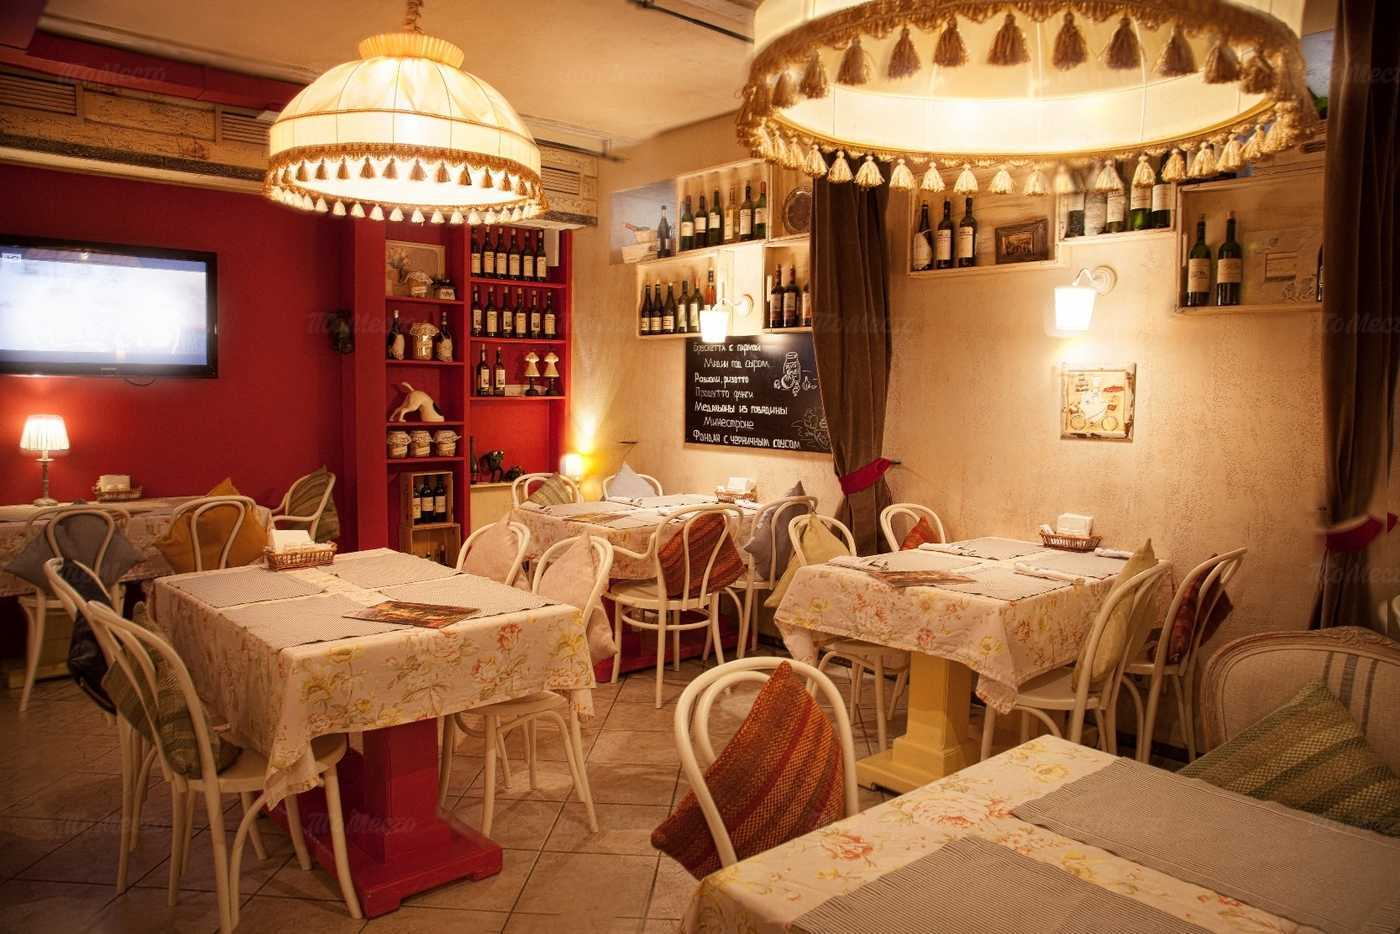 Ресторан Папа Пицциано (Papa Pizziano) на Новочеркасском проспекте фото 5